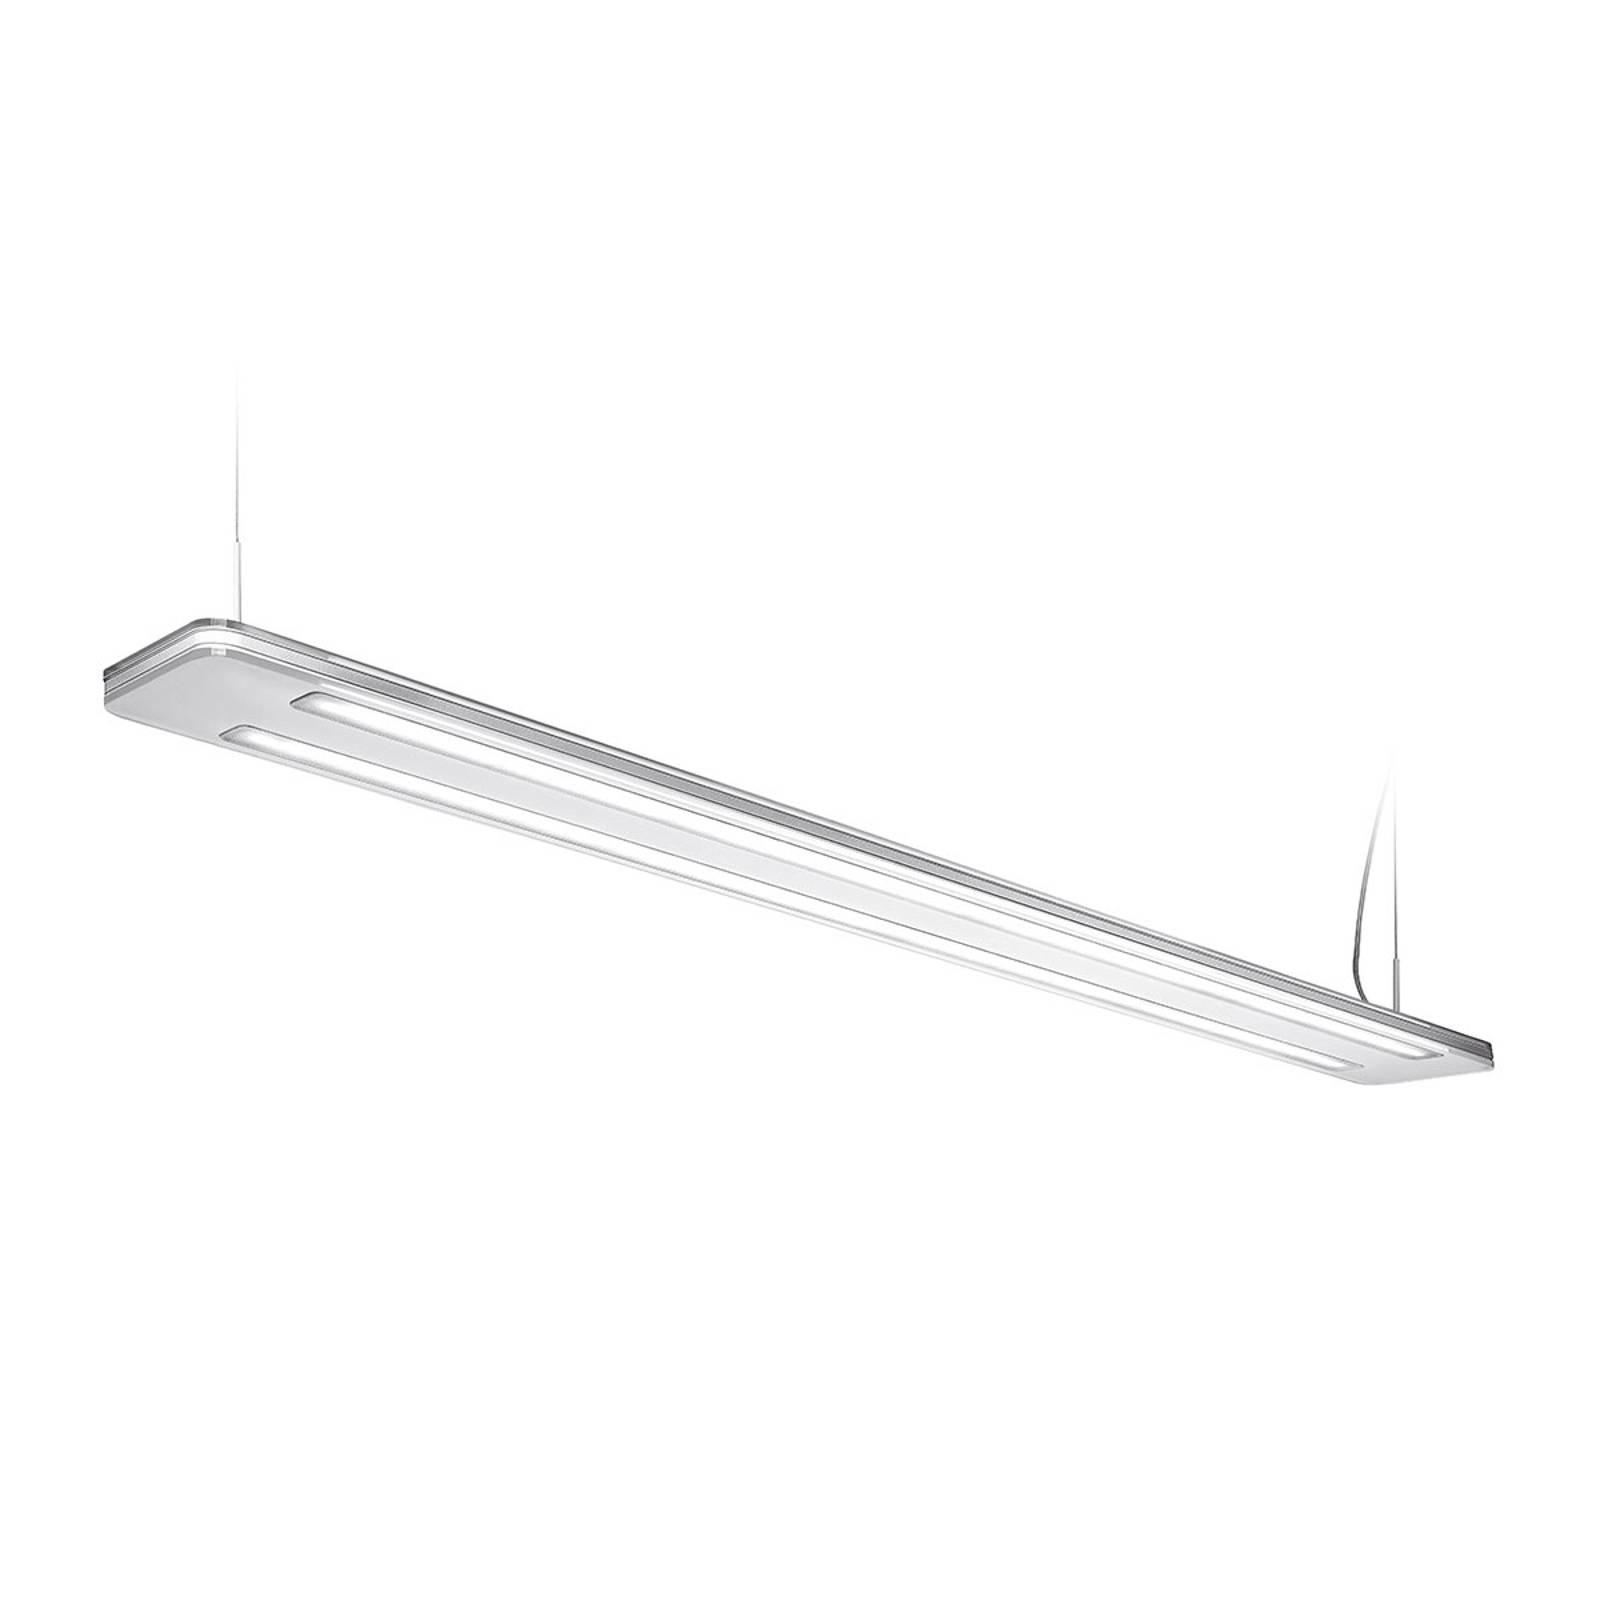 LED-Pendelleuchte Trentino II, 83 W, weiß